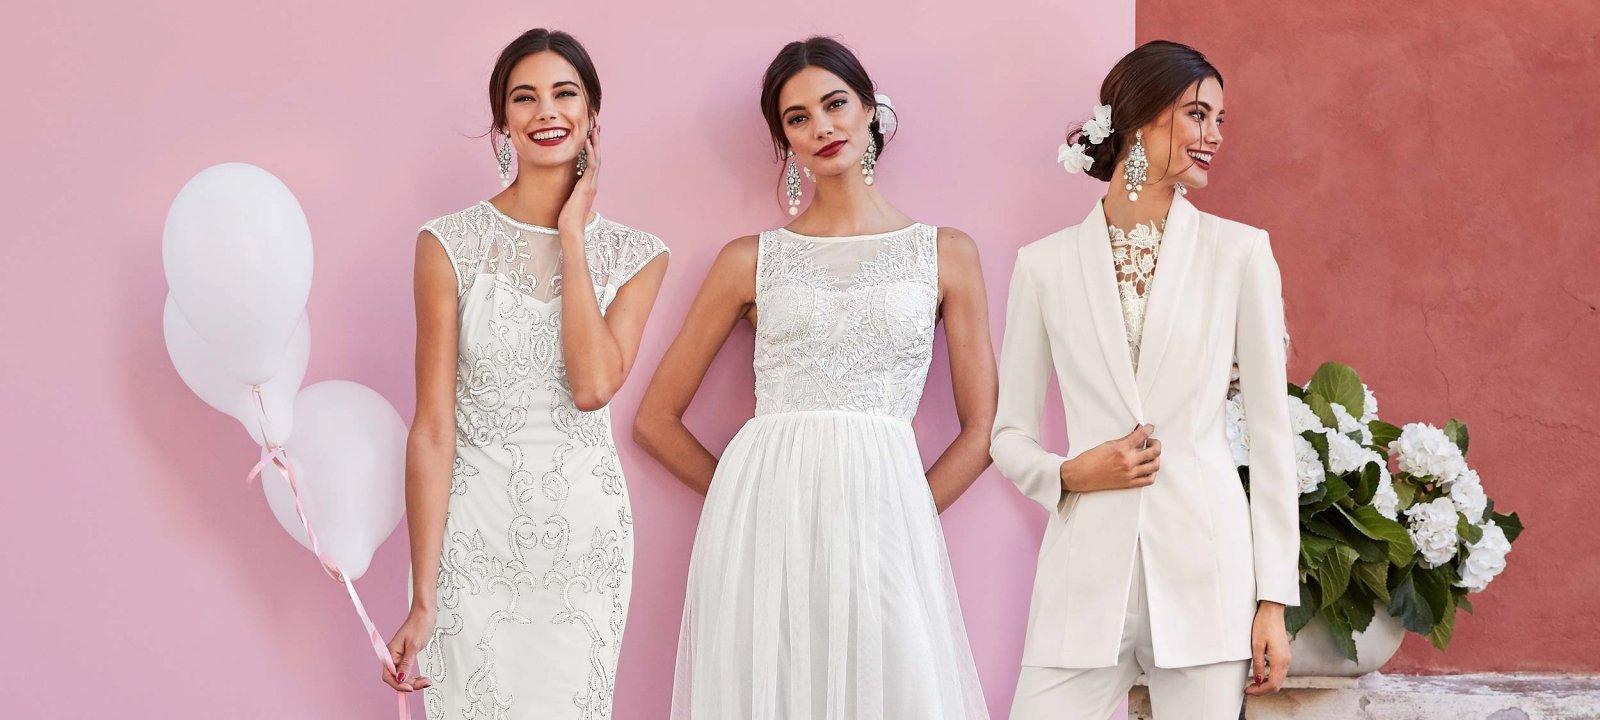 Luxus Abendkleid Ballkleid Langarm Tull Perlen Glitzer Youtube Abendkleid